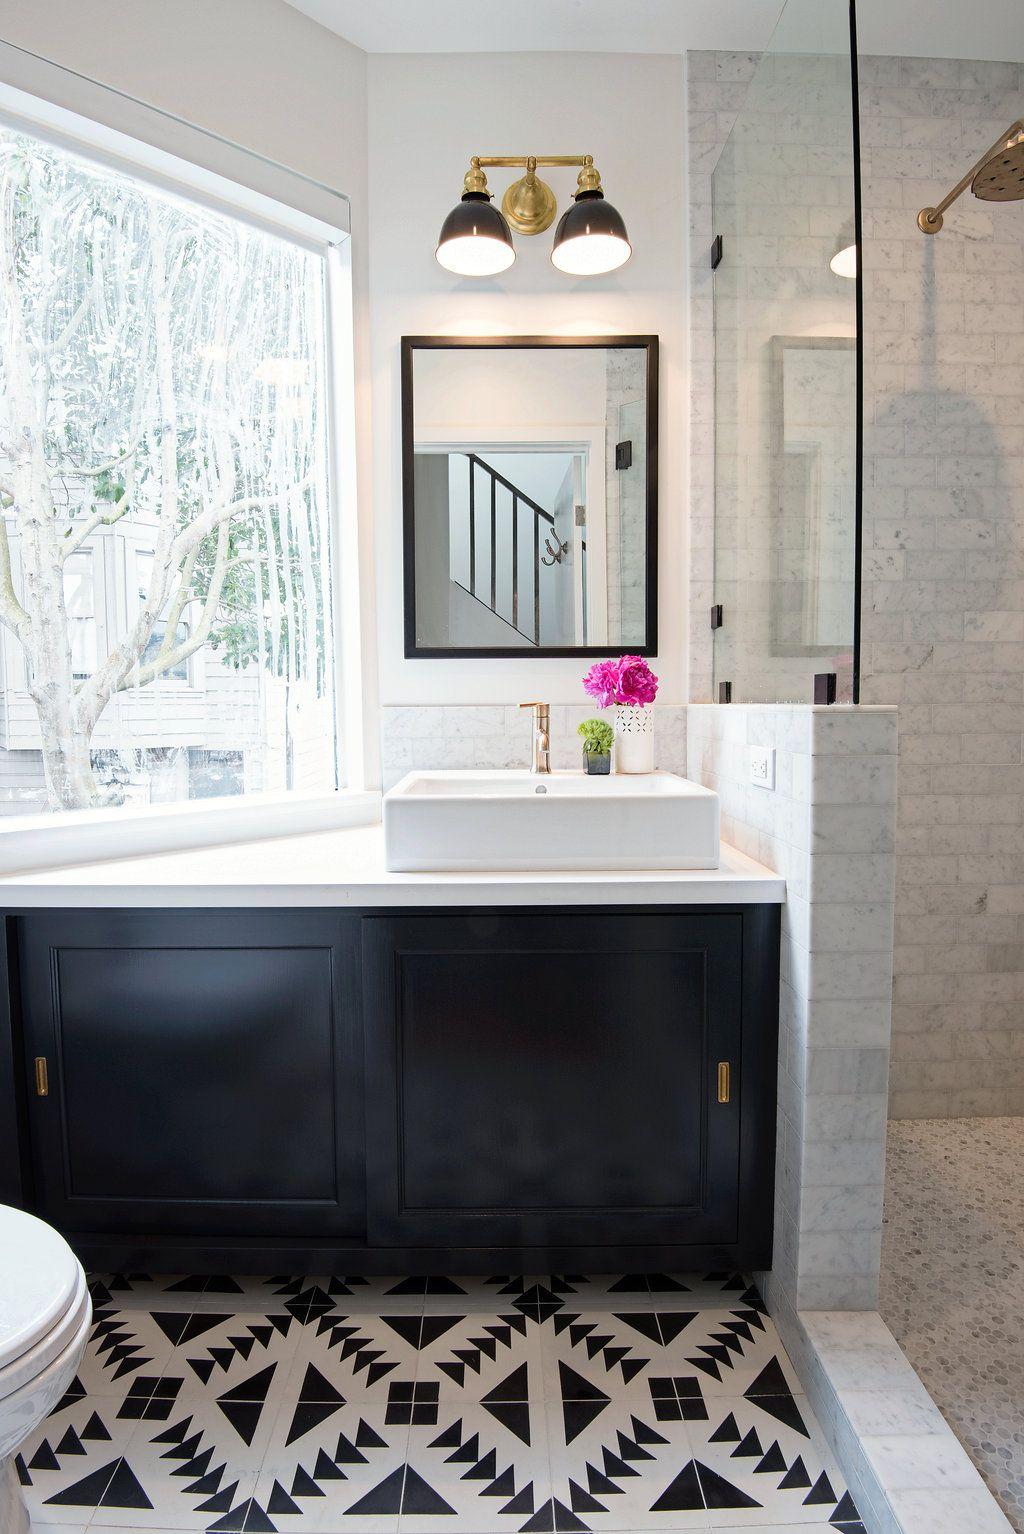 White quartz countertop with carrara tile | House | Pinterest ...